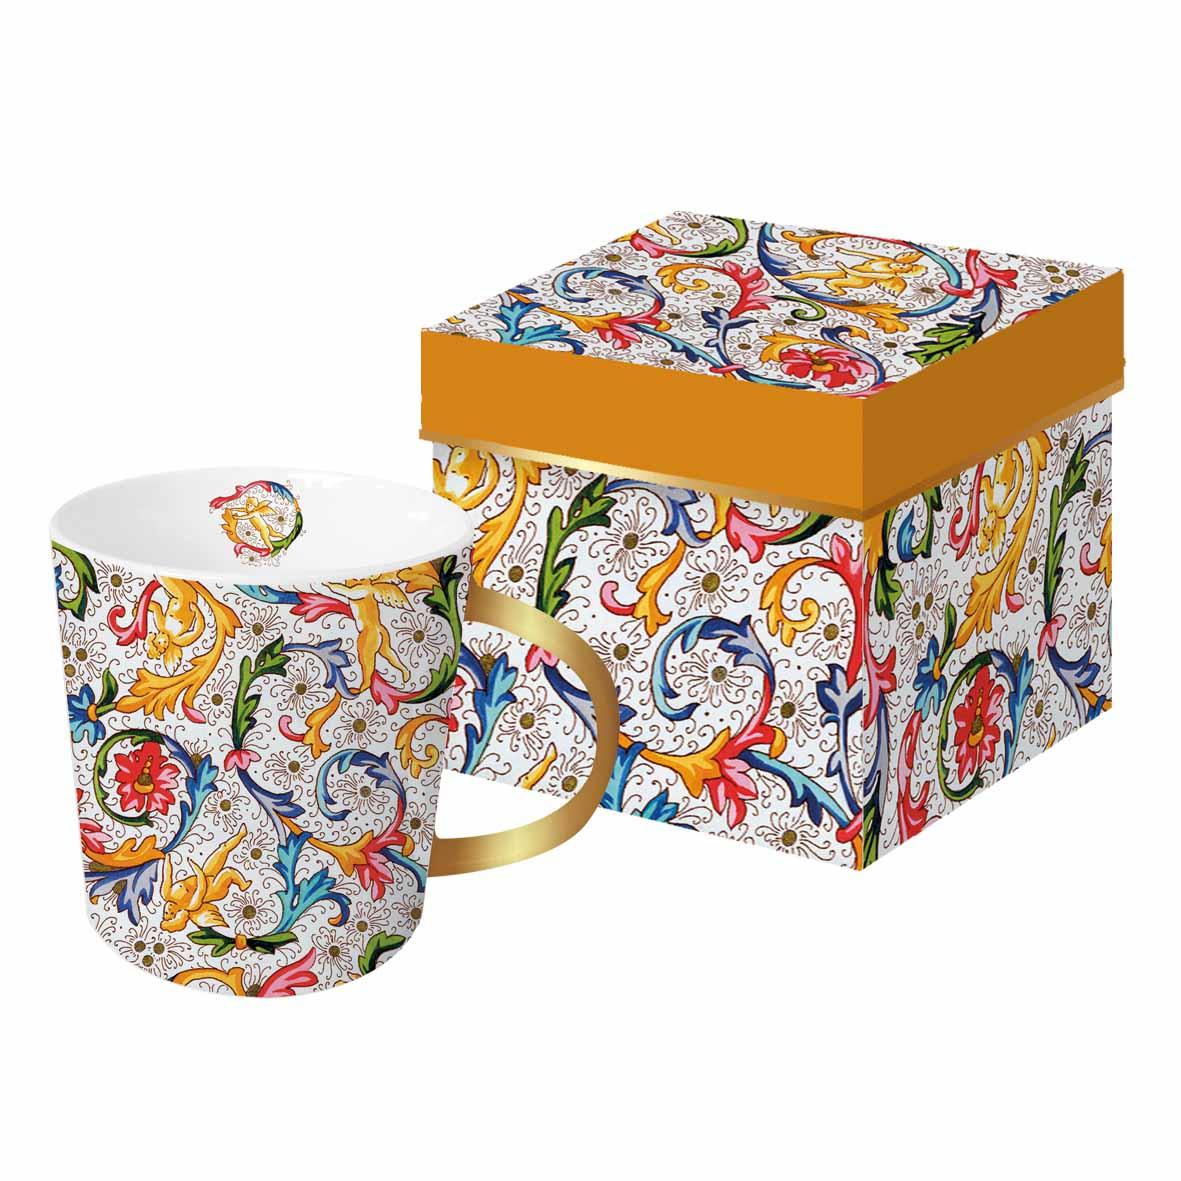 Šolja u poklon kutiji FIORENTINA REAL GOLD